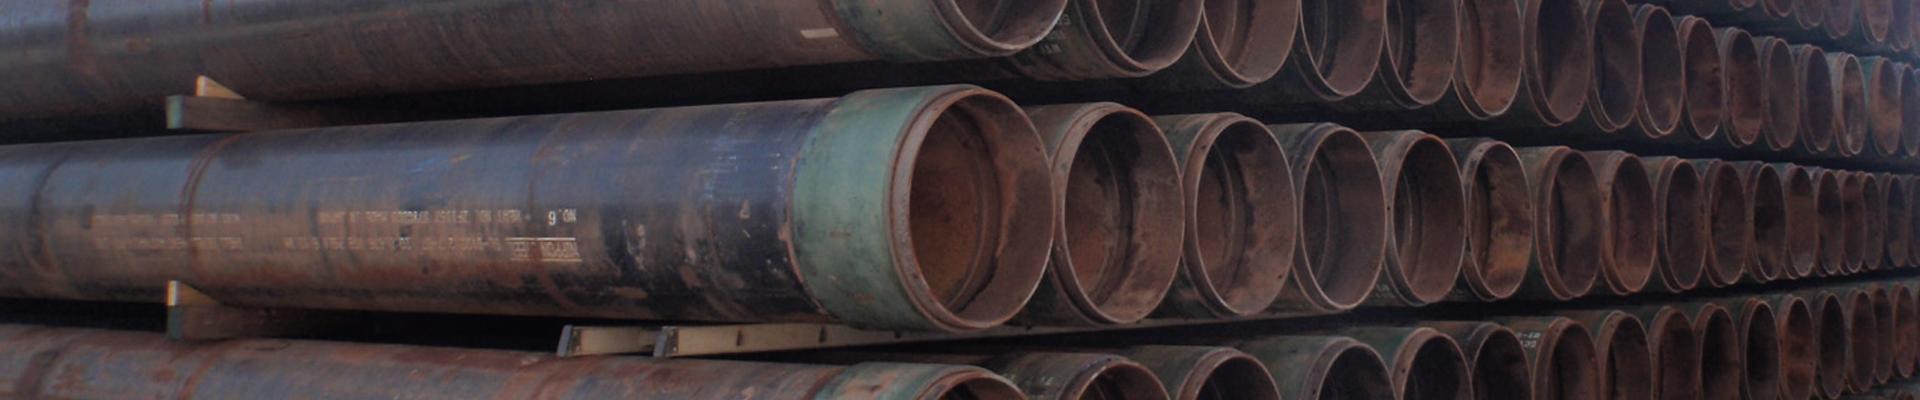 Fast and reliable service Australia wide & Steelpipes | Steel Pipe Supplies u0026 Stockists Australia